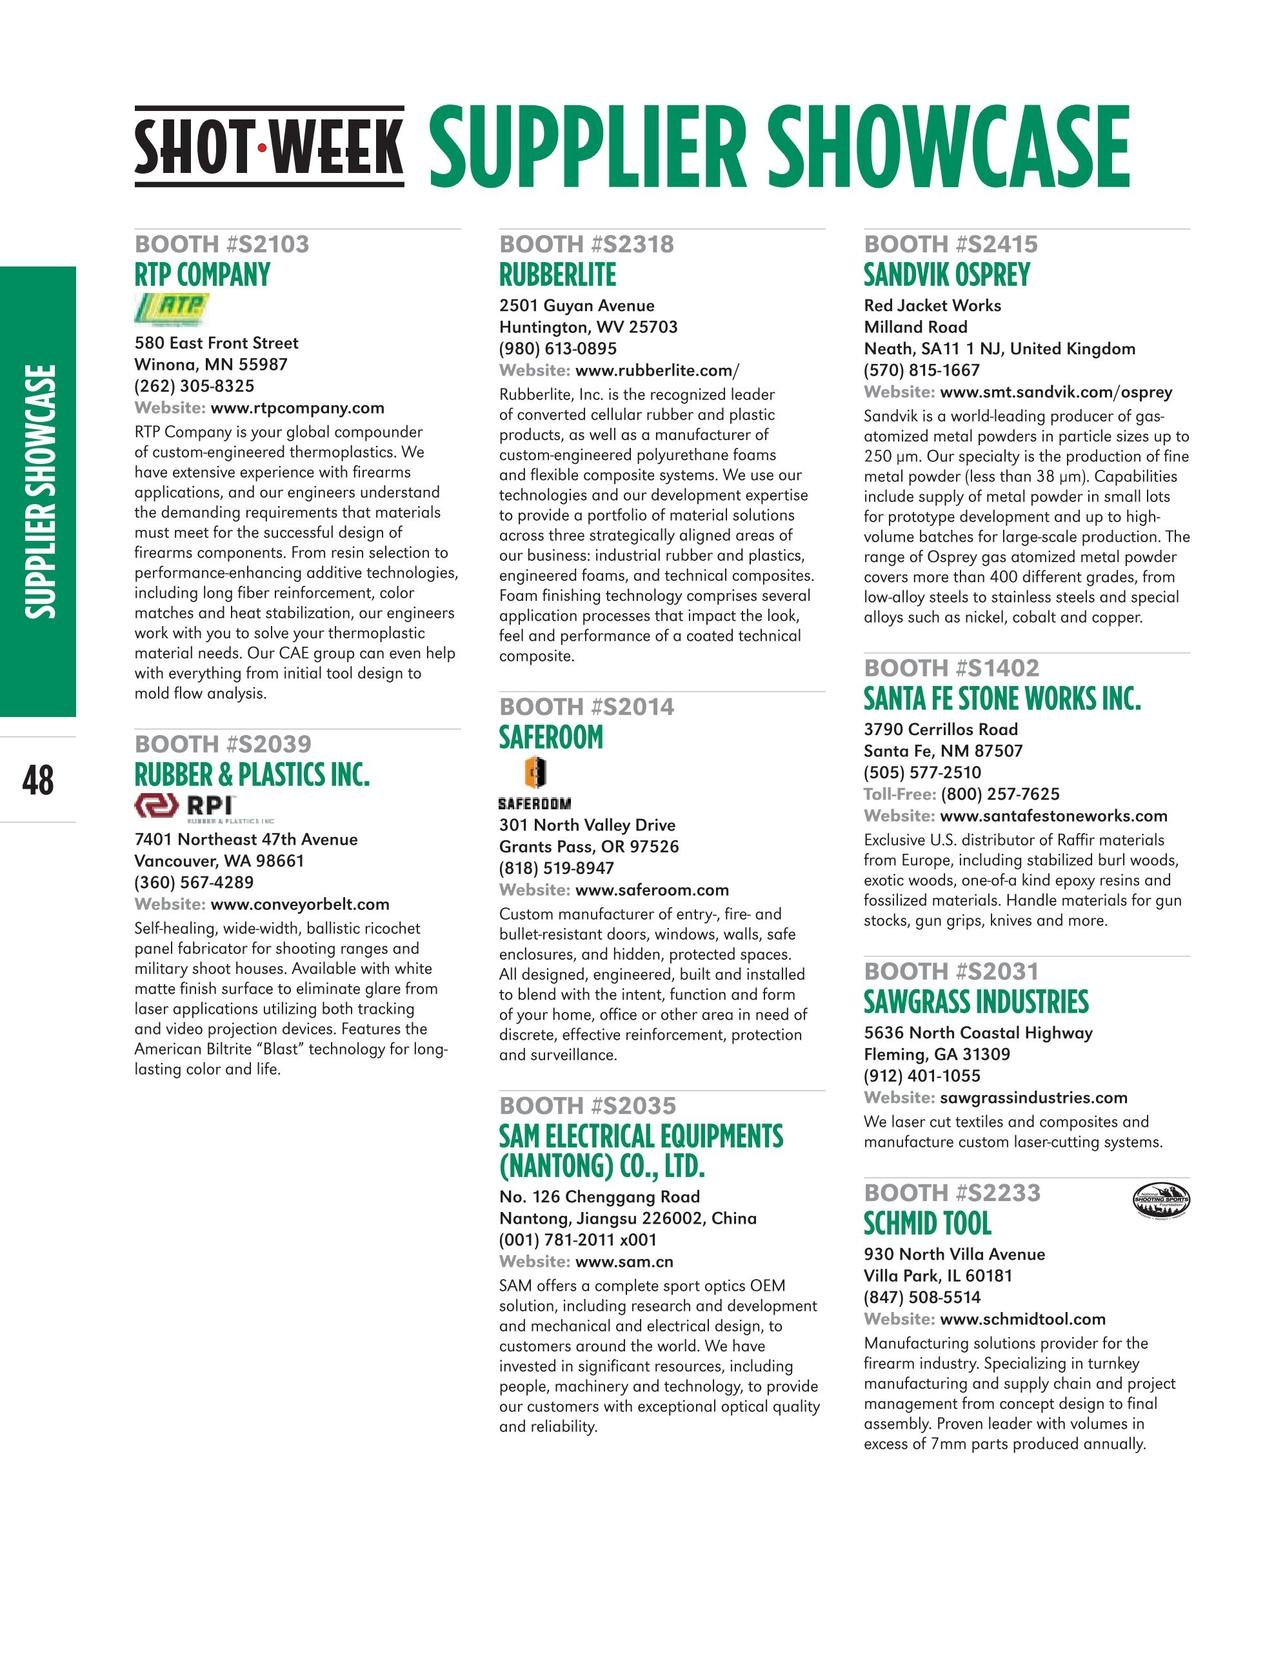 SHOT Week Supplier Showcase - 2018 Directory